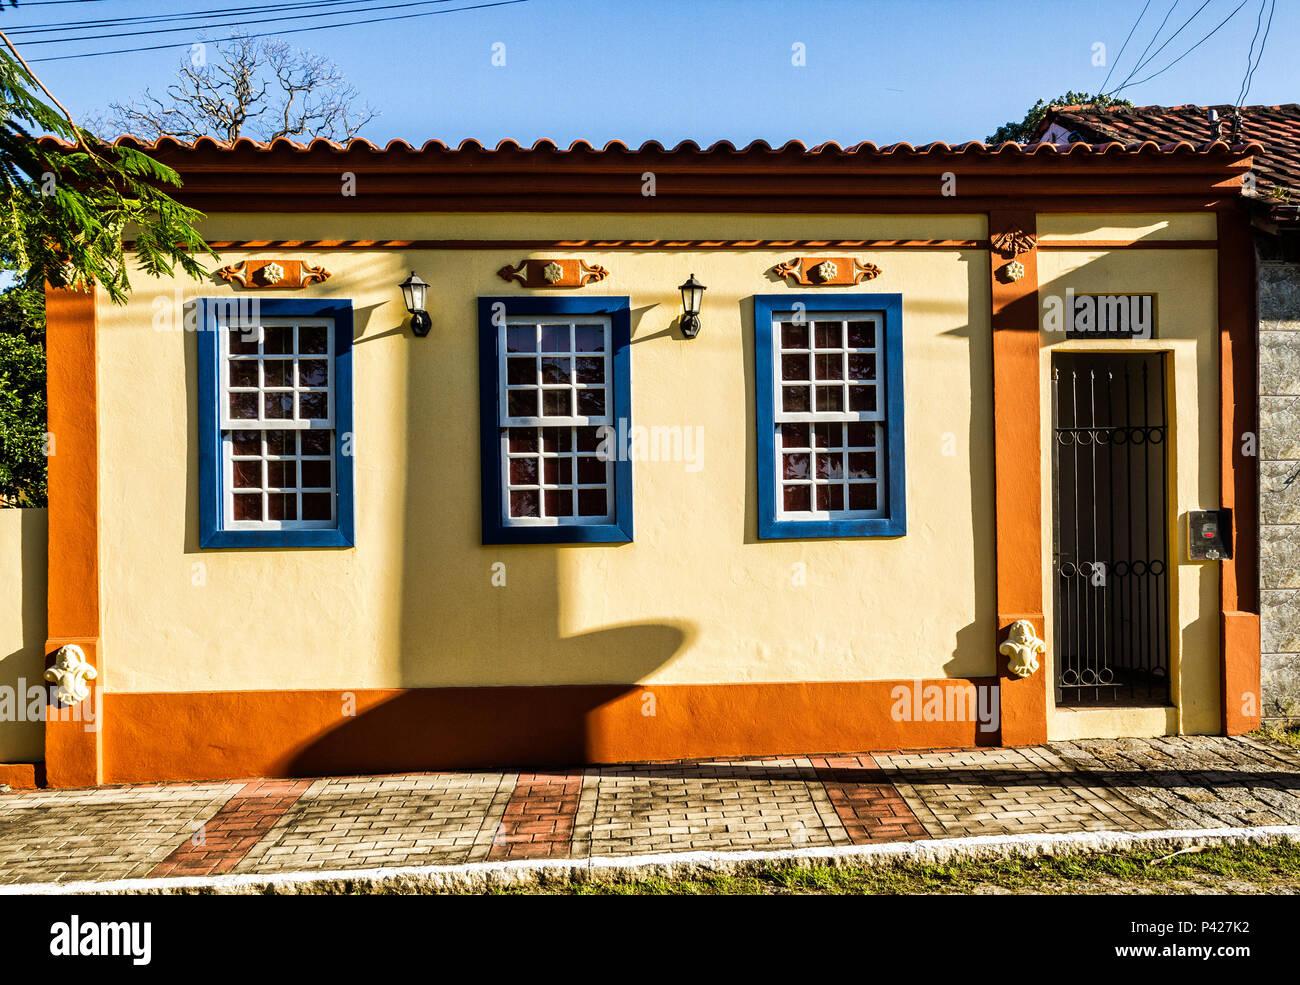 Detalhe de fachada de casa colonial na Enseada do Brito. Palhoça, Santa Catarina, Brasil. Stock Photo